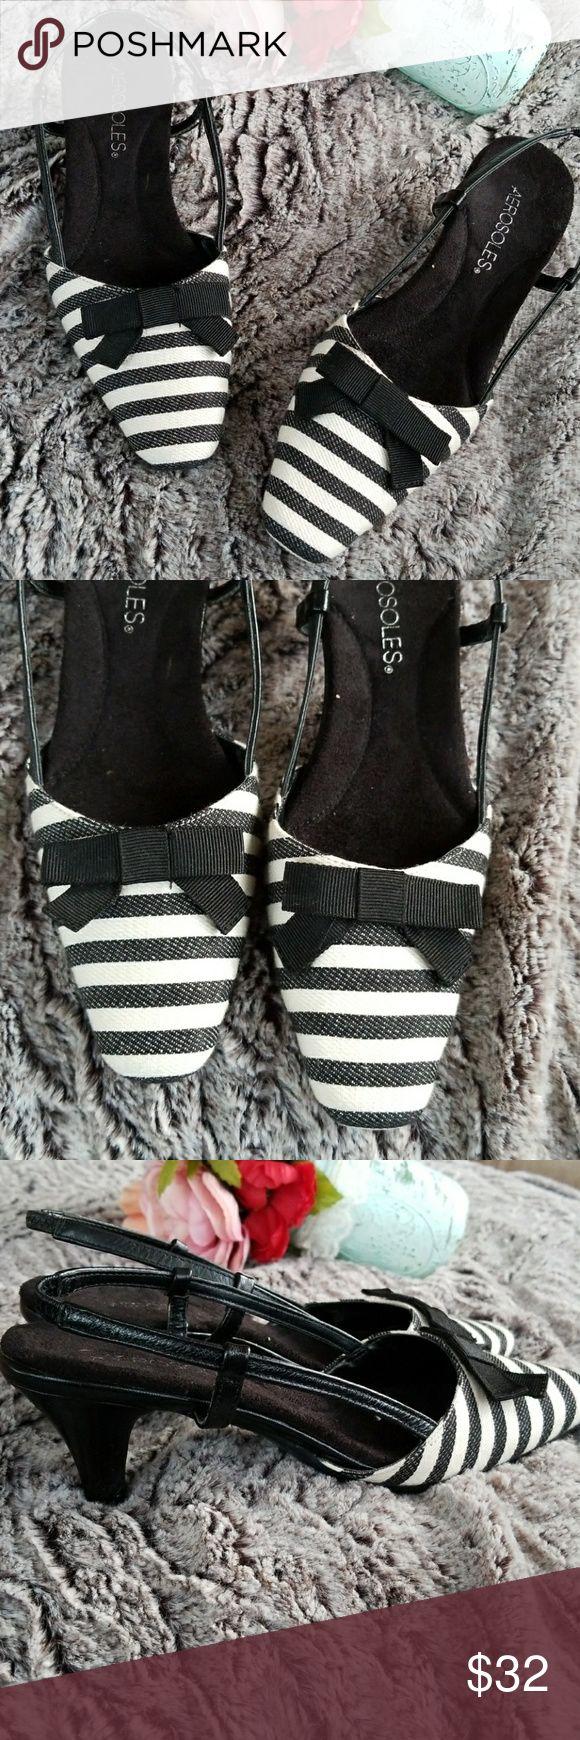 ⚠️Lowball Angebot OfferAerosoles Slingbacks Entzückende schwarz-weiße Aero …   – My Posh Picks